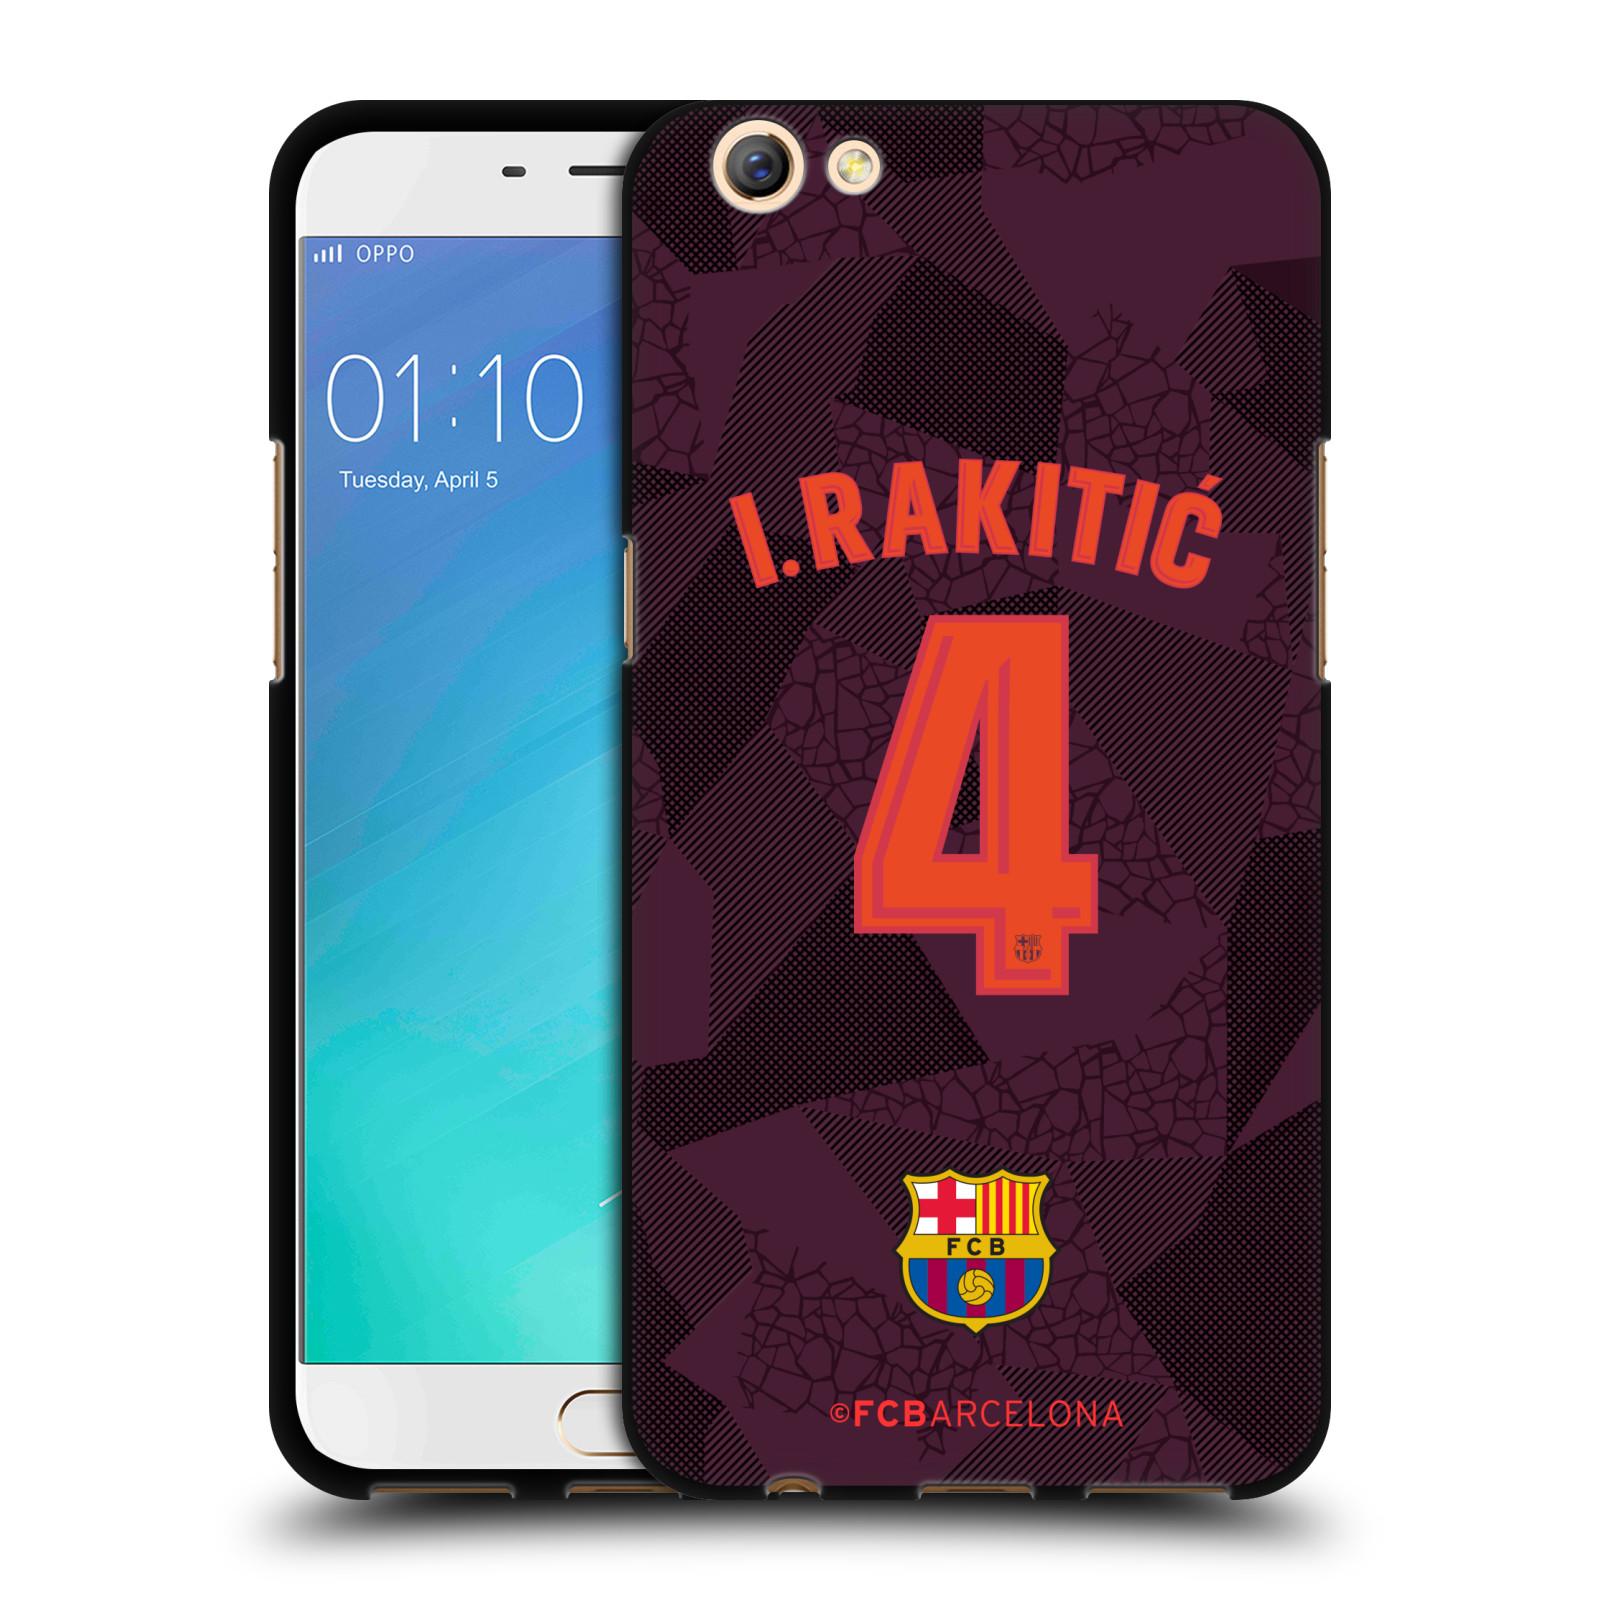 OFFICIAL-FC-BARCELONA-2017-18-PLAYERS-THIRD-KIT-1-BLACK-GEL-CASE-FOR-OPPO-PHONES